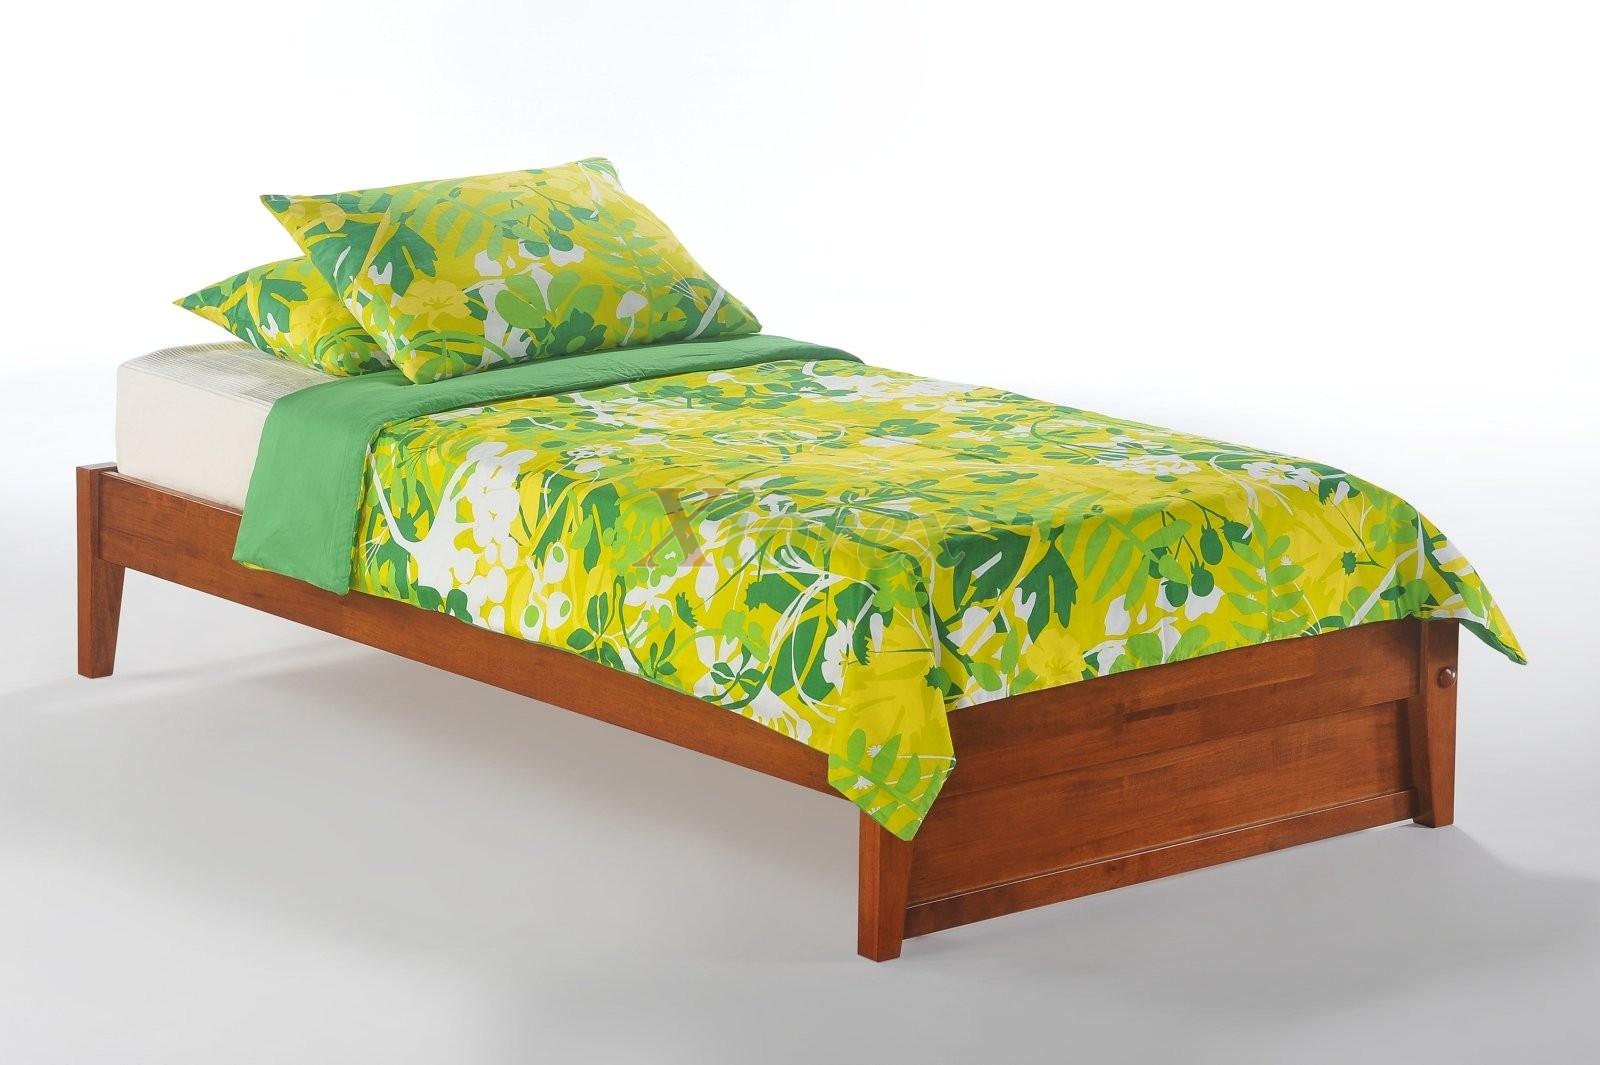 Bedroom furniture spices night day basic bed set for Furniture n more beds